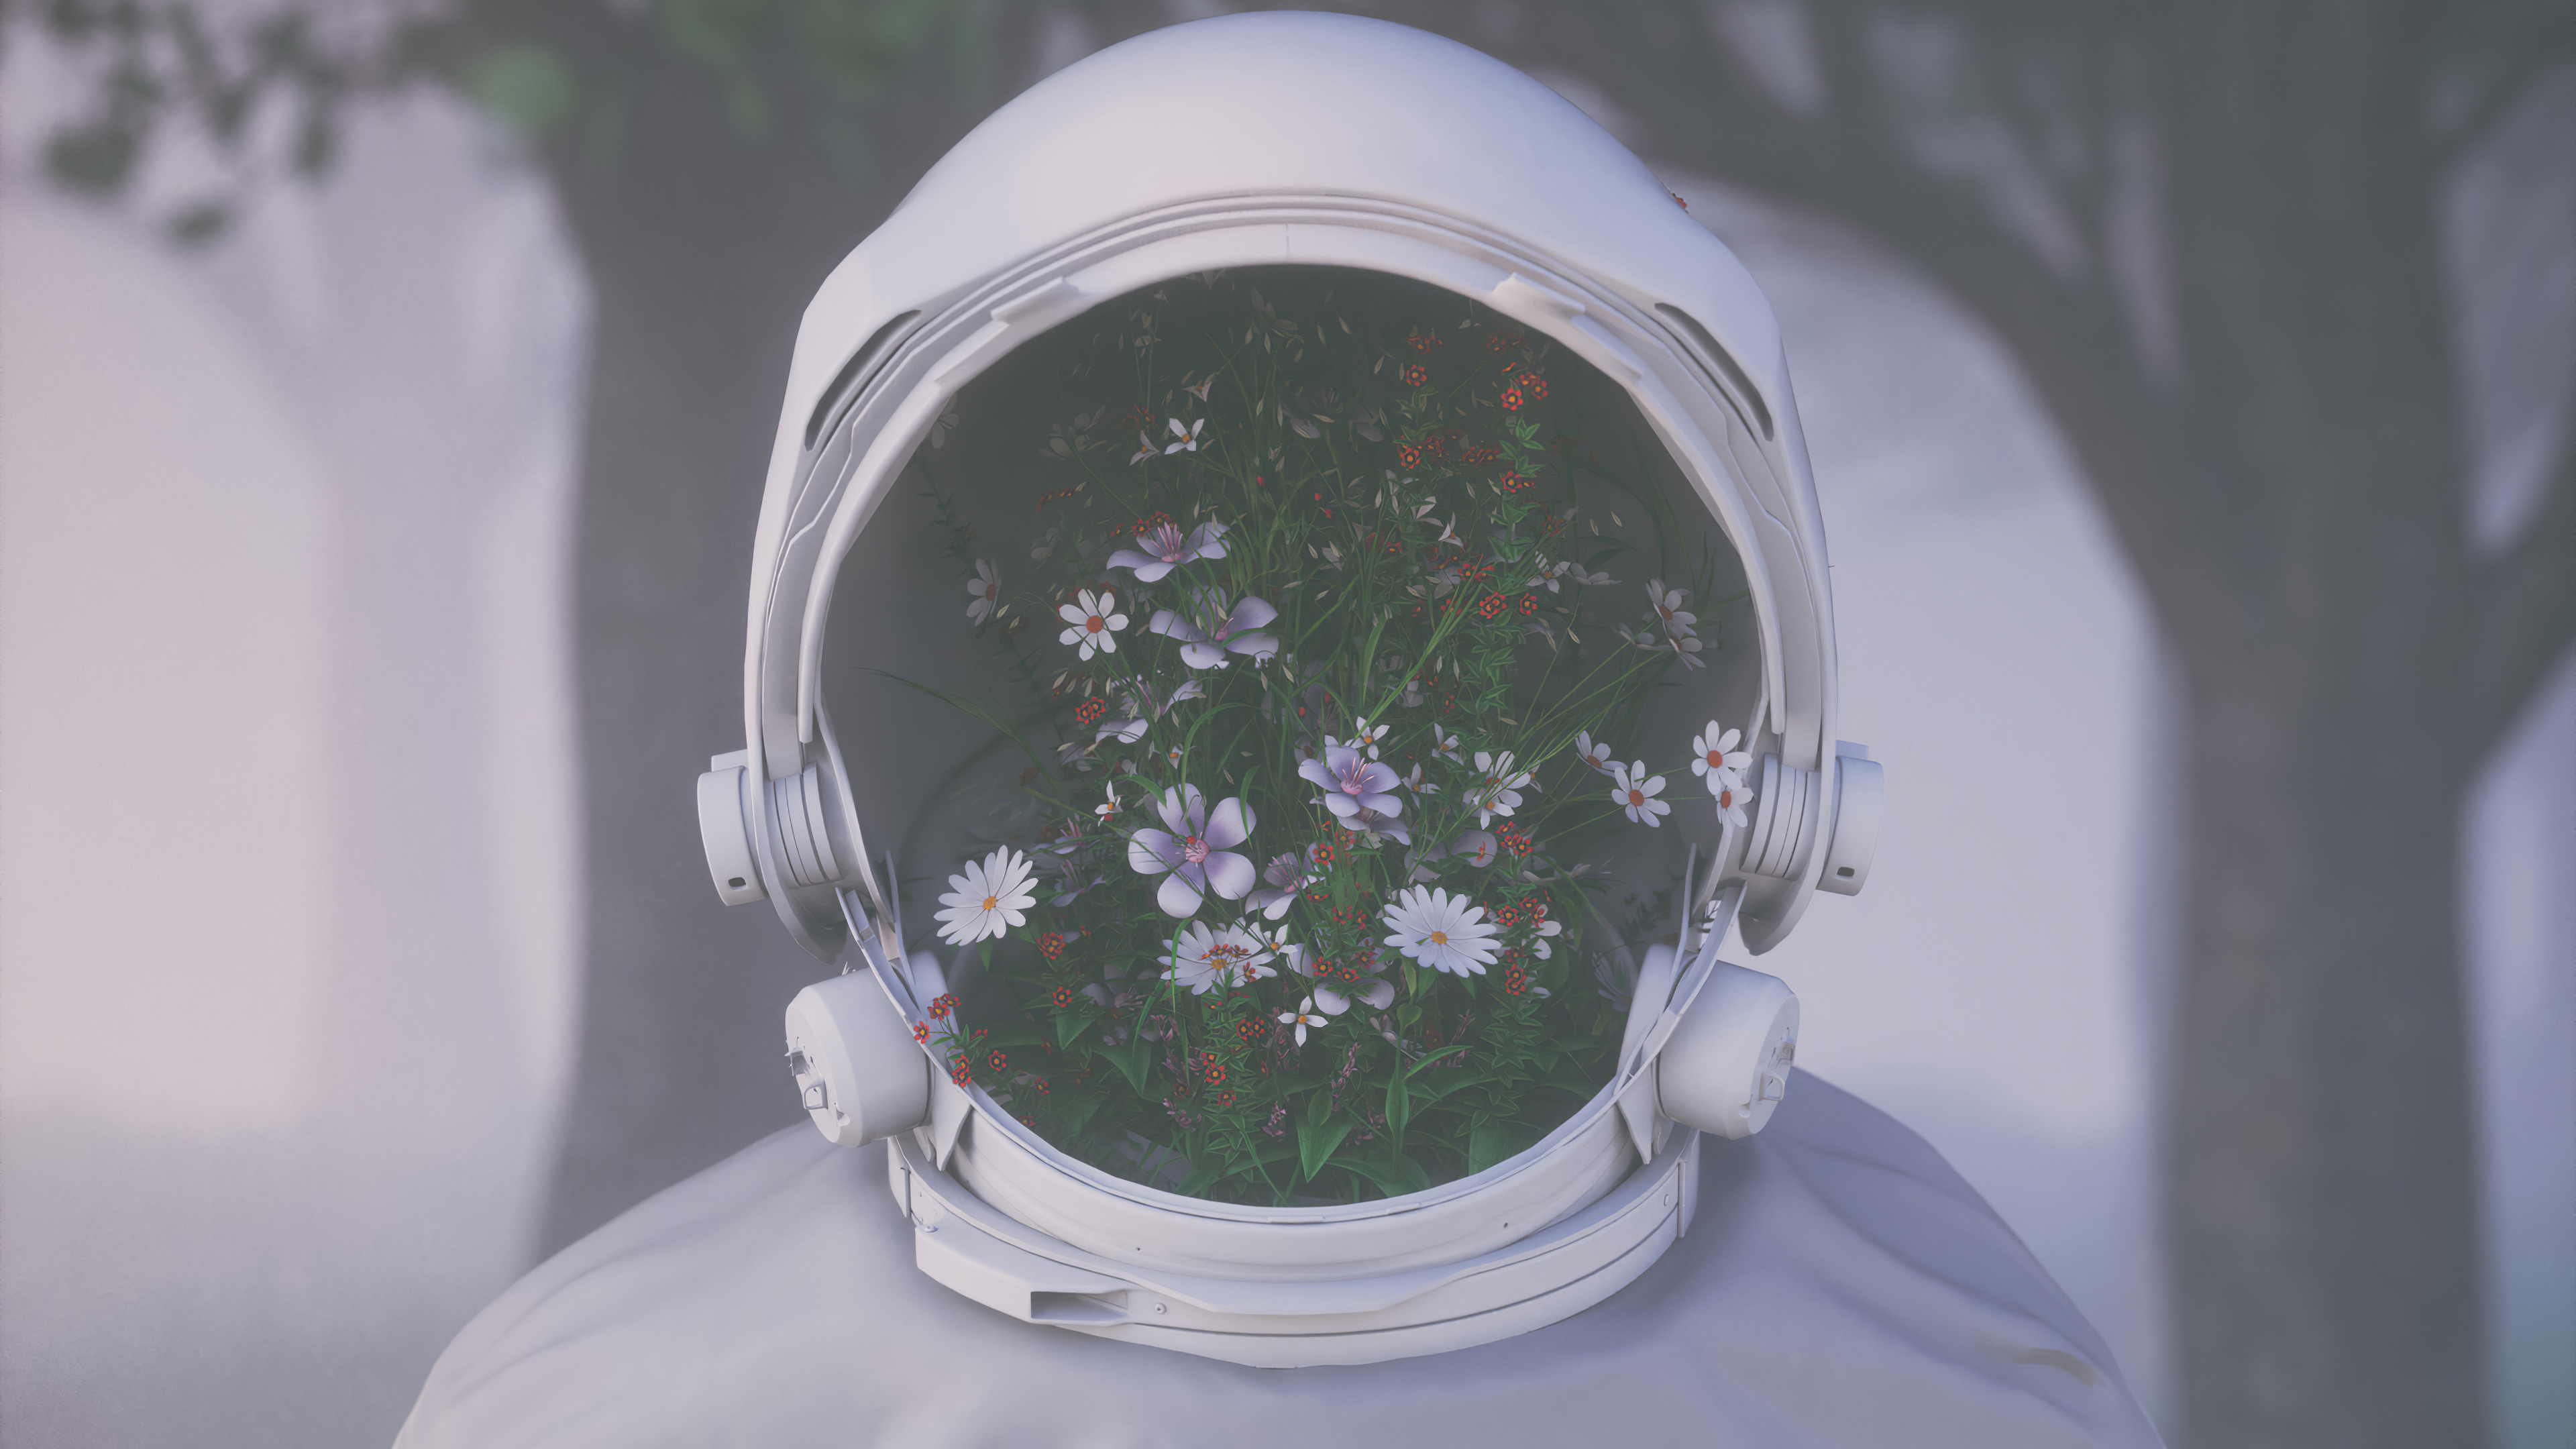 astronaut face reveal 1574938632 - Astronaut Face Reveal -